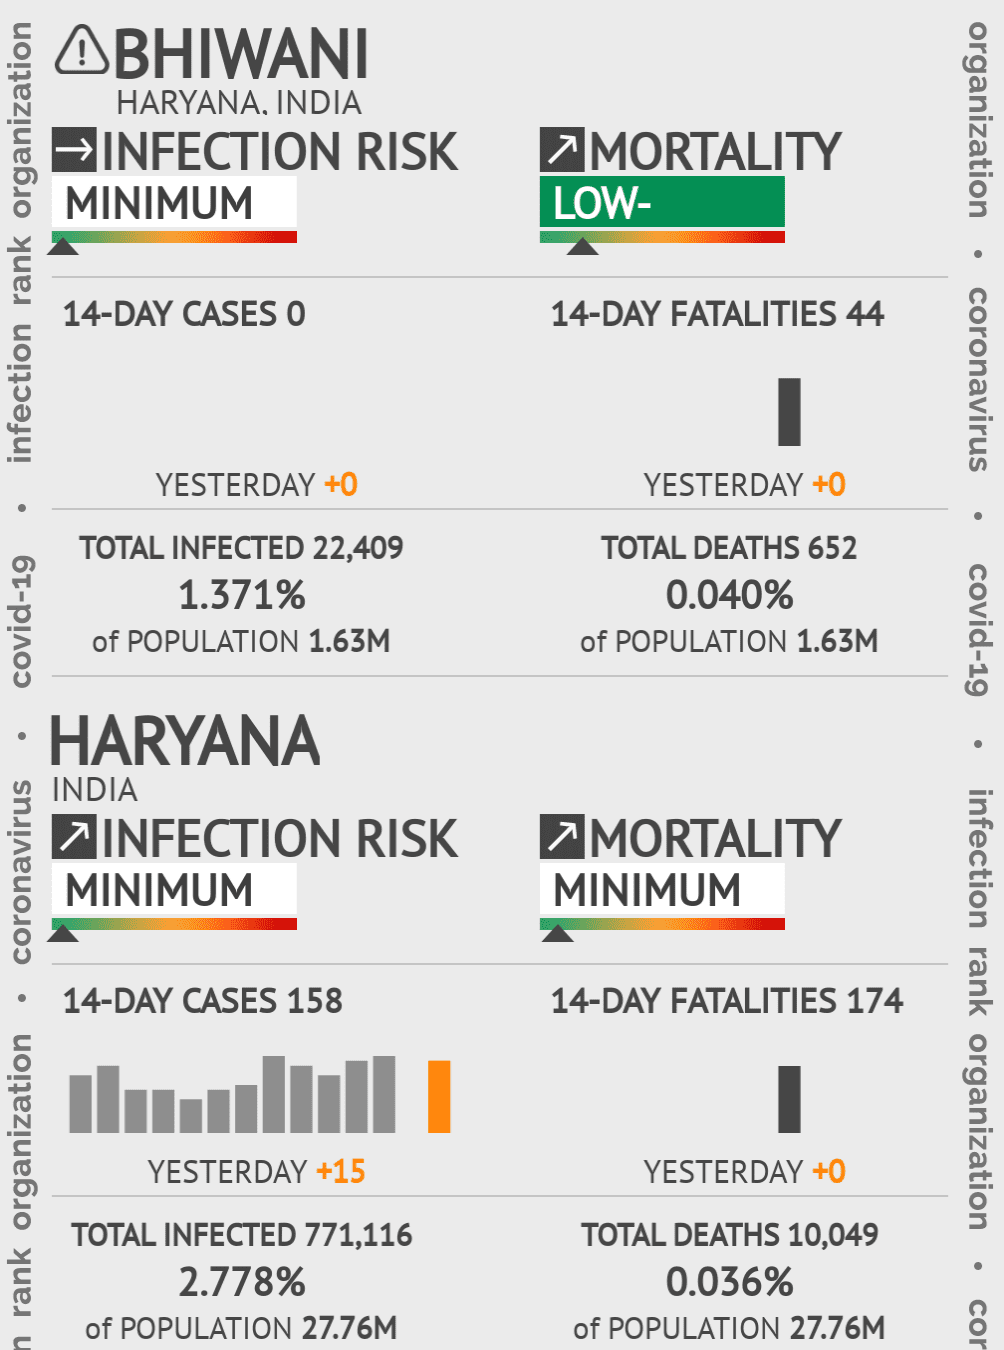 Bhiwani Coronavirus Covid-19 Risk of Infection on February 27, 2021